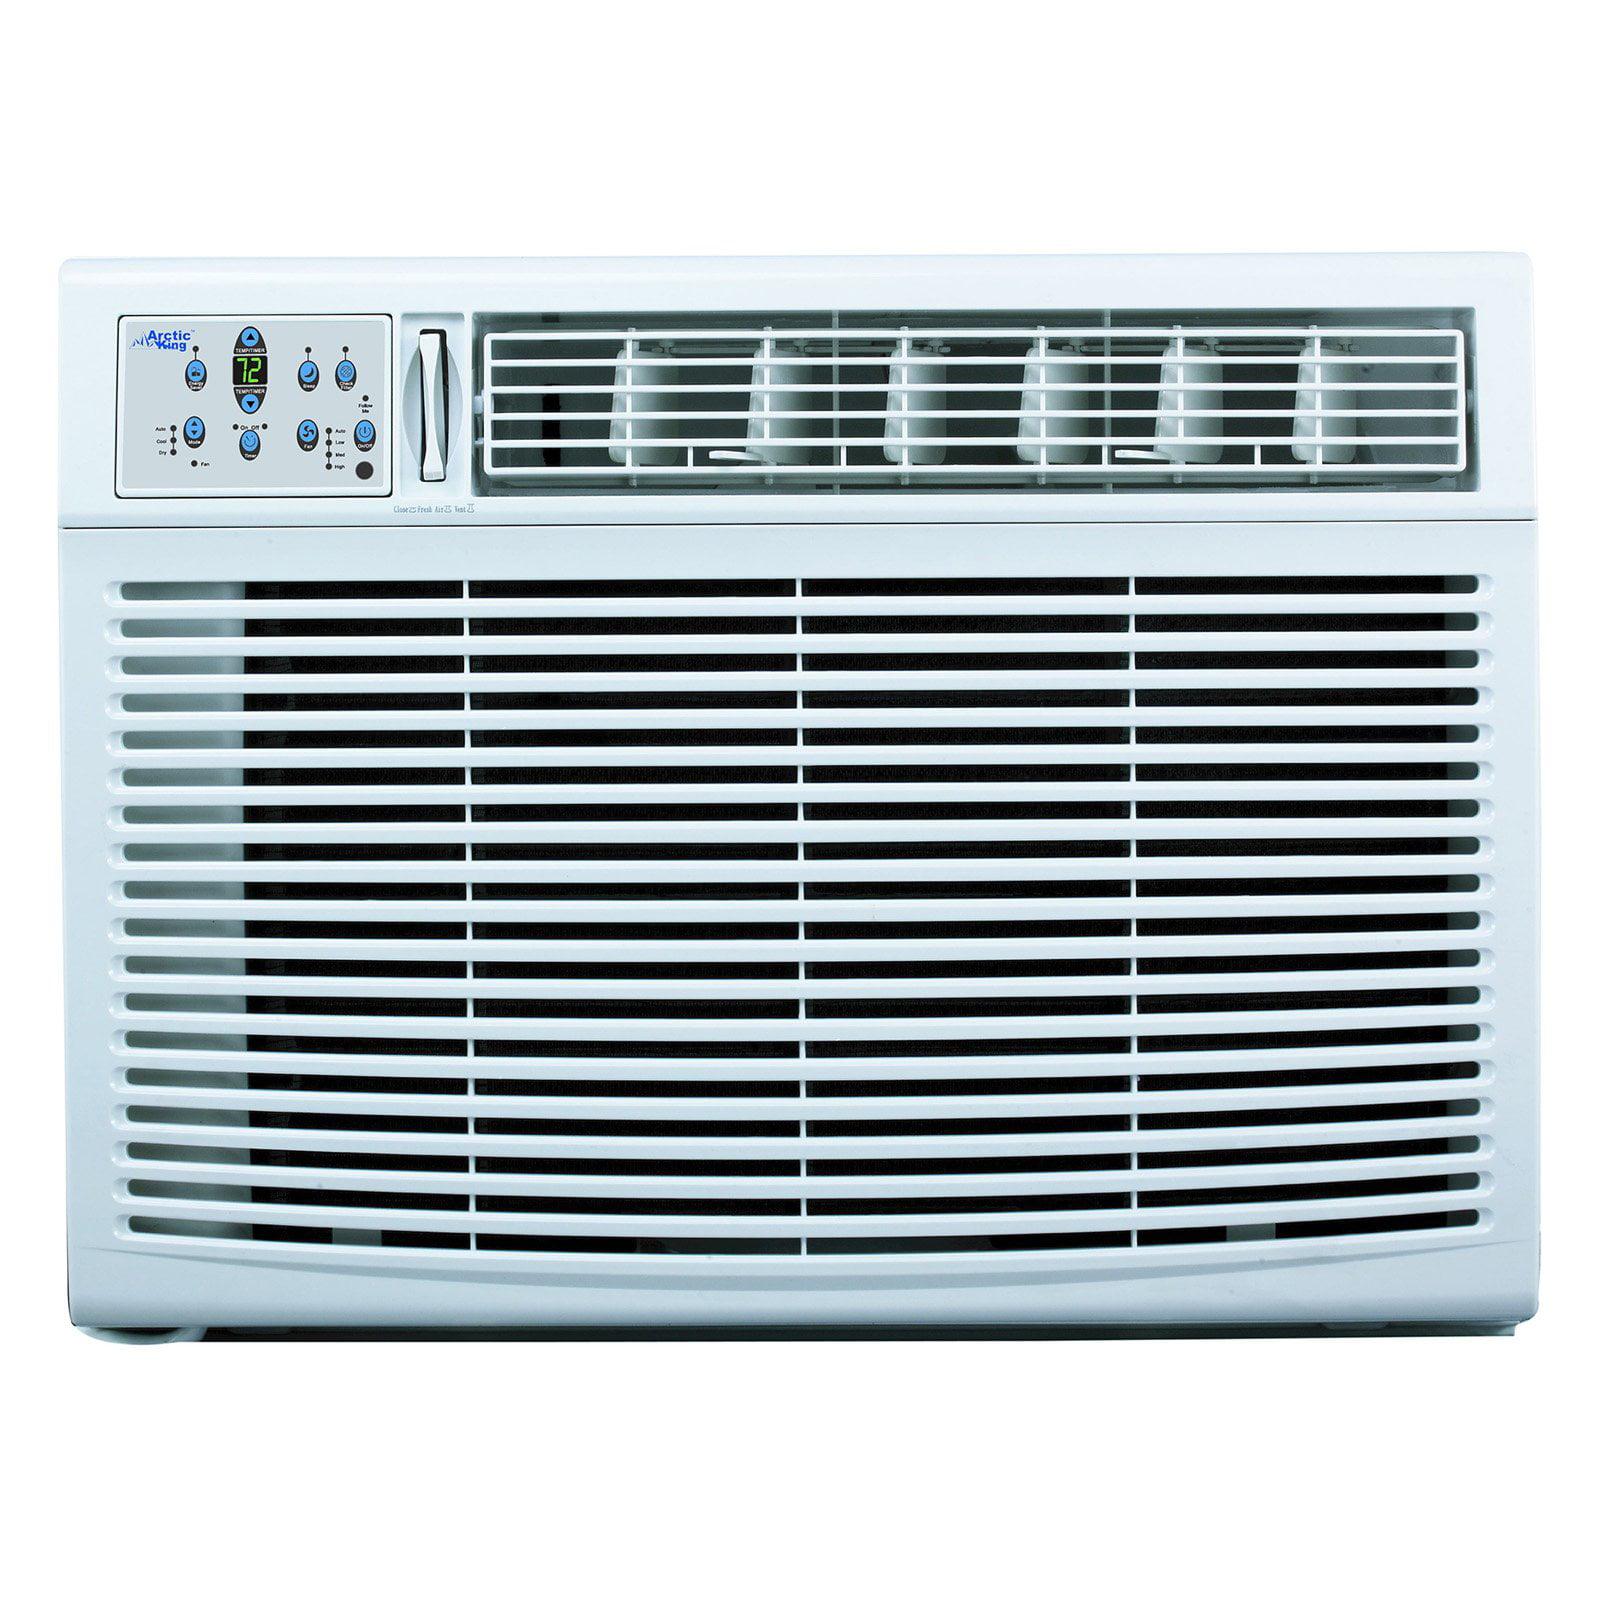 Arctic 18K 208V Window Air Conditioner